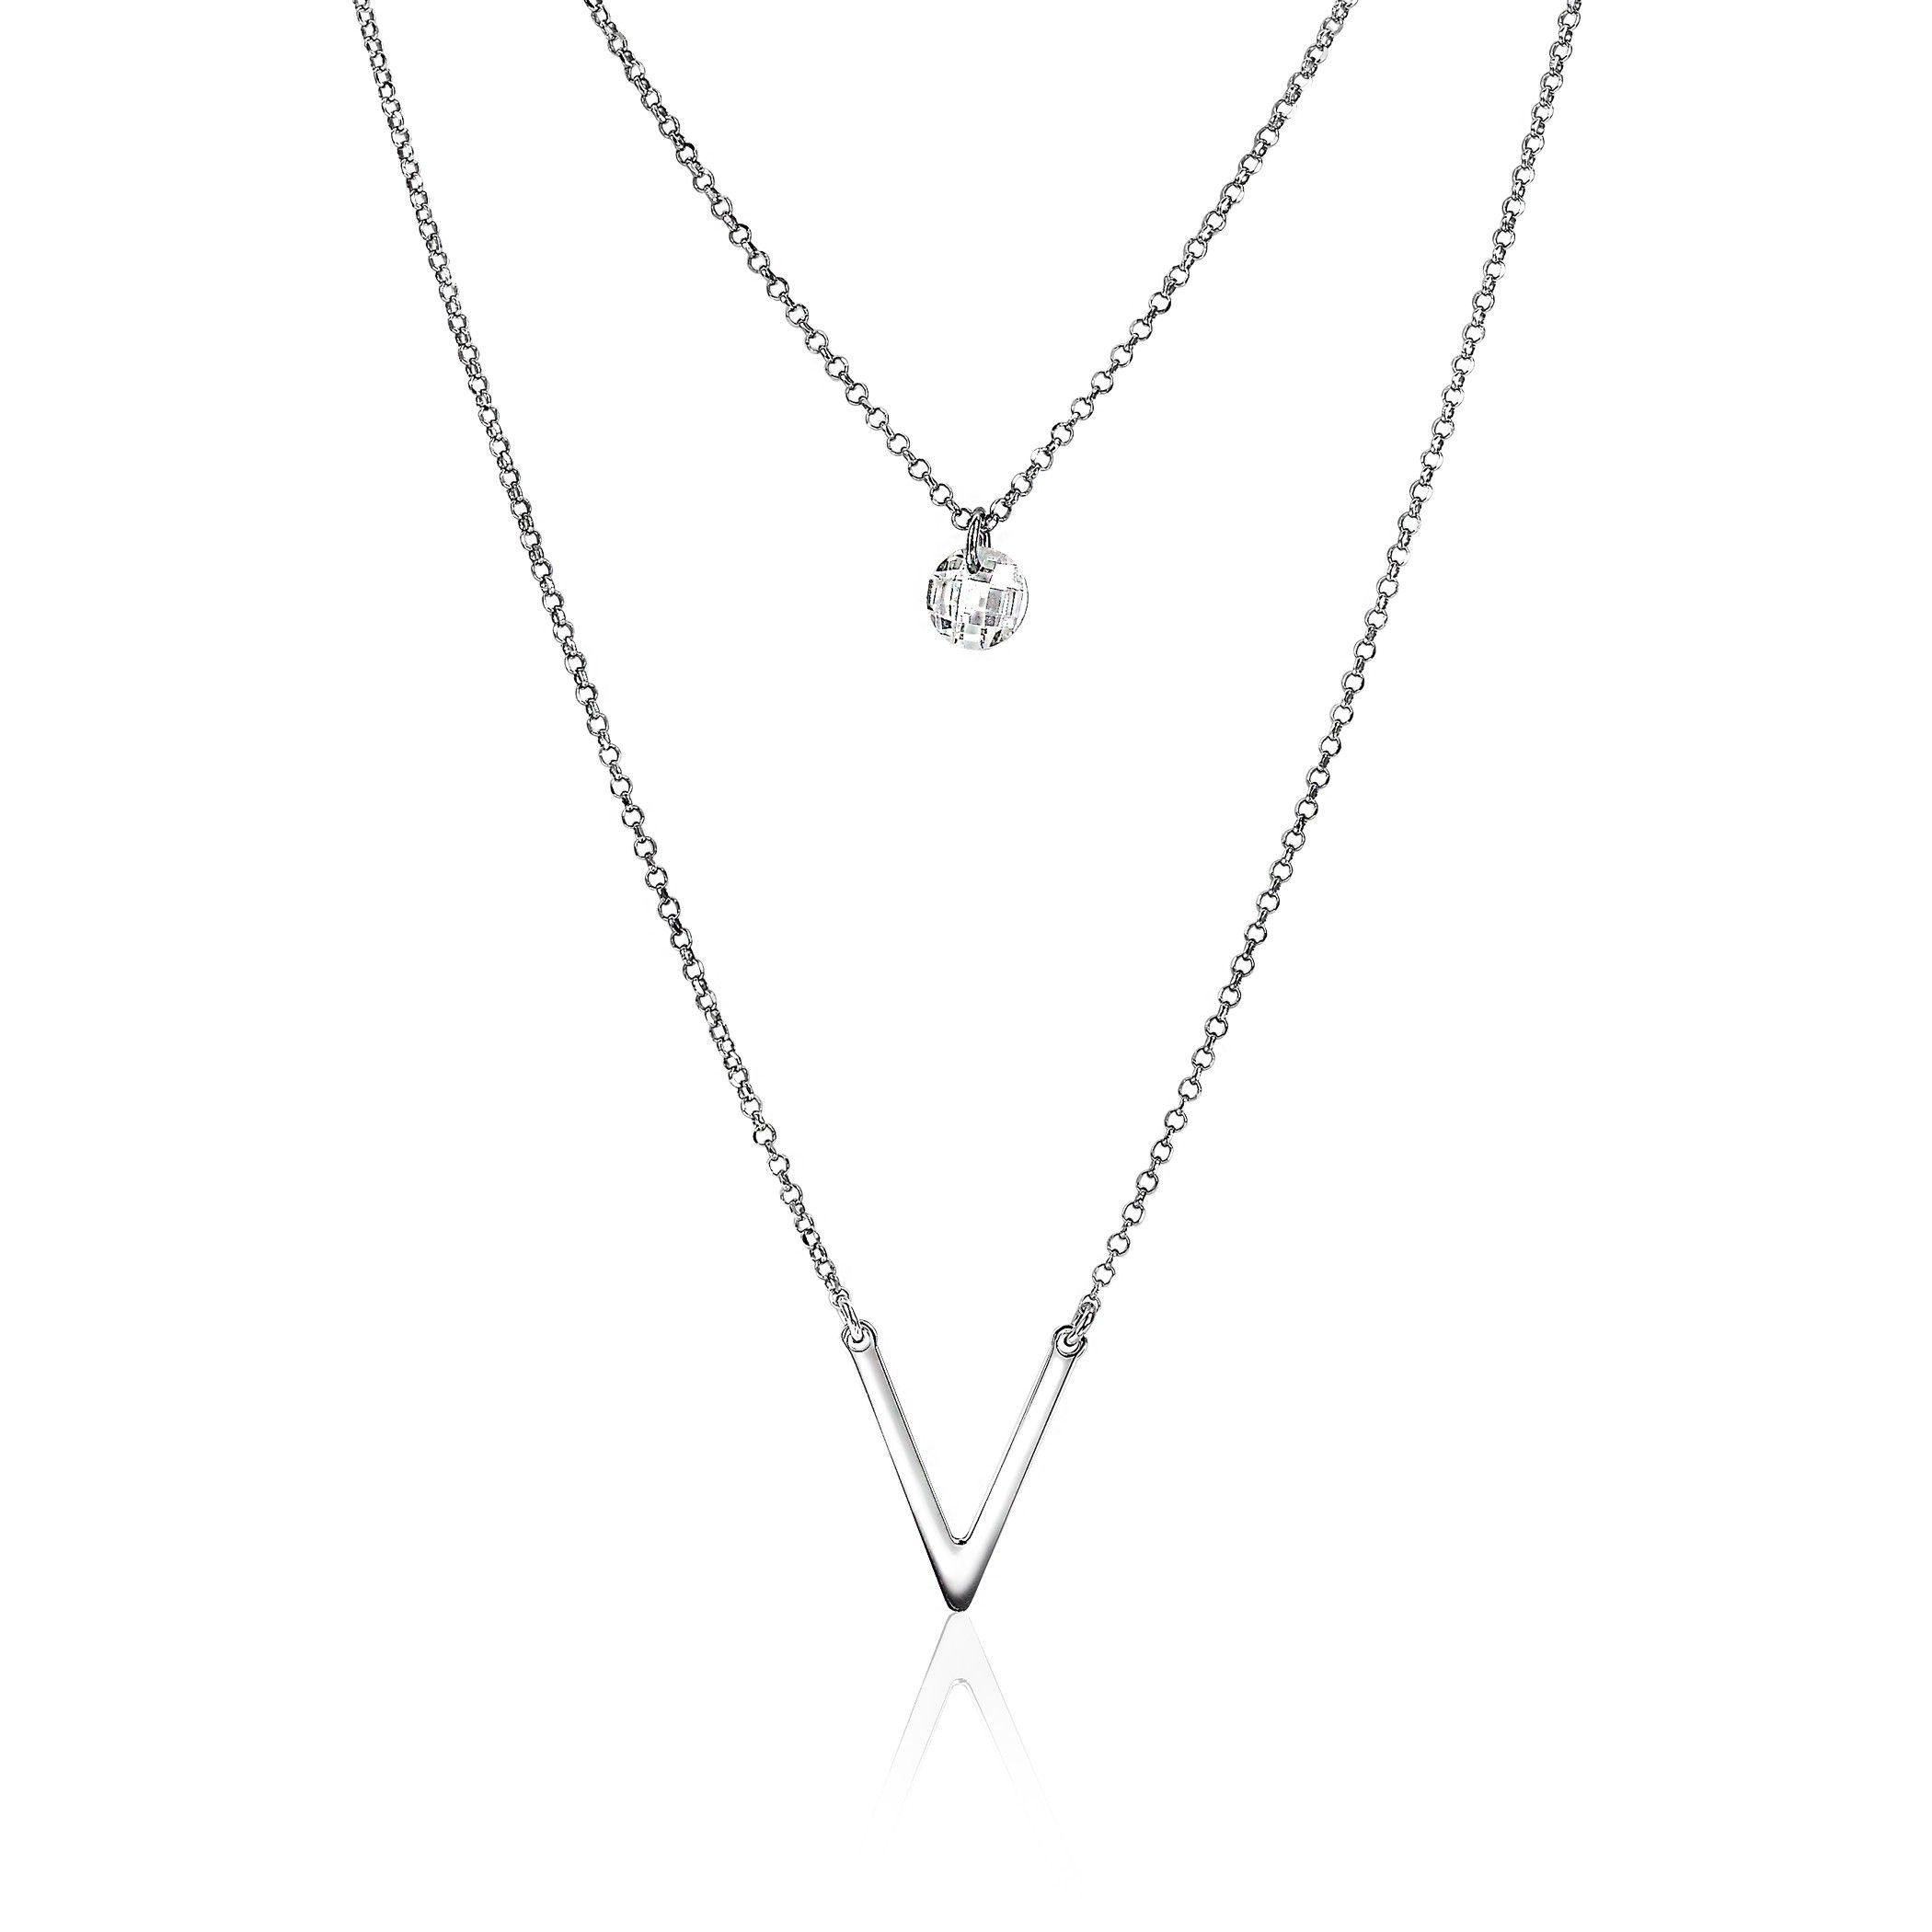 deea99153d8 Zinzi zilveren ketting ronde rijzetting wit 40-45cm ZIC1067   Jewelry -  Silver, Jewelry en Minimalist